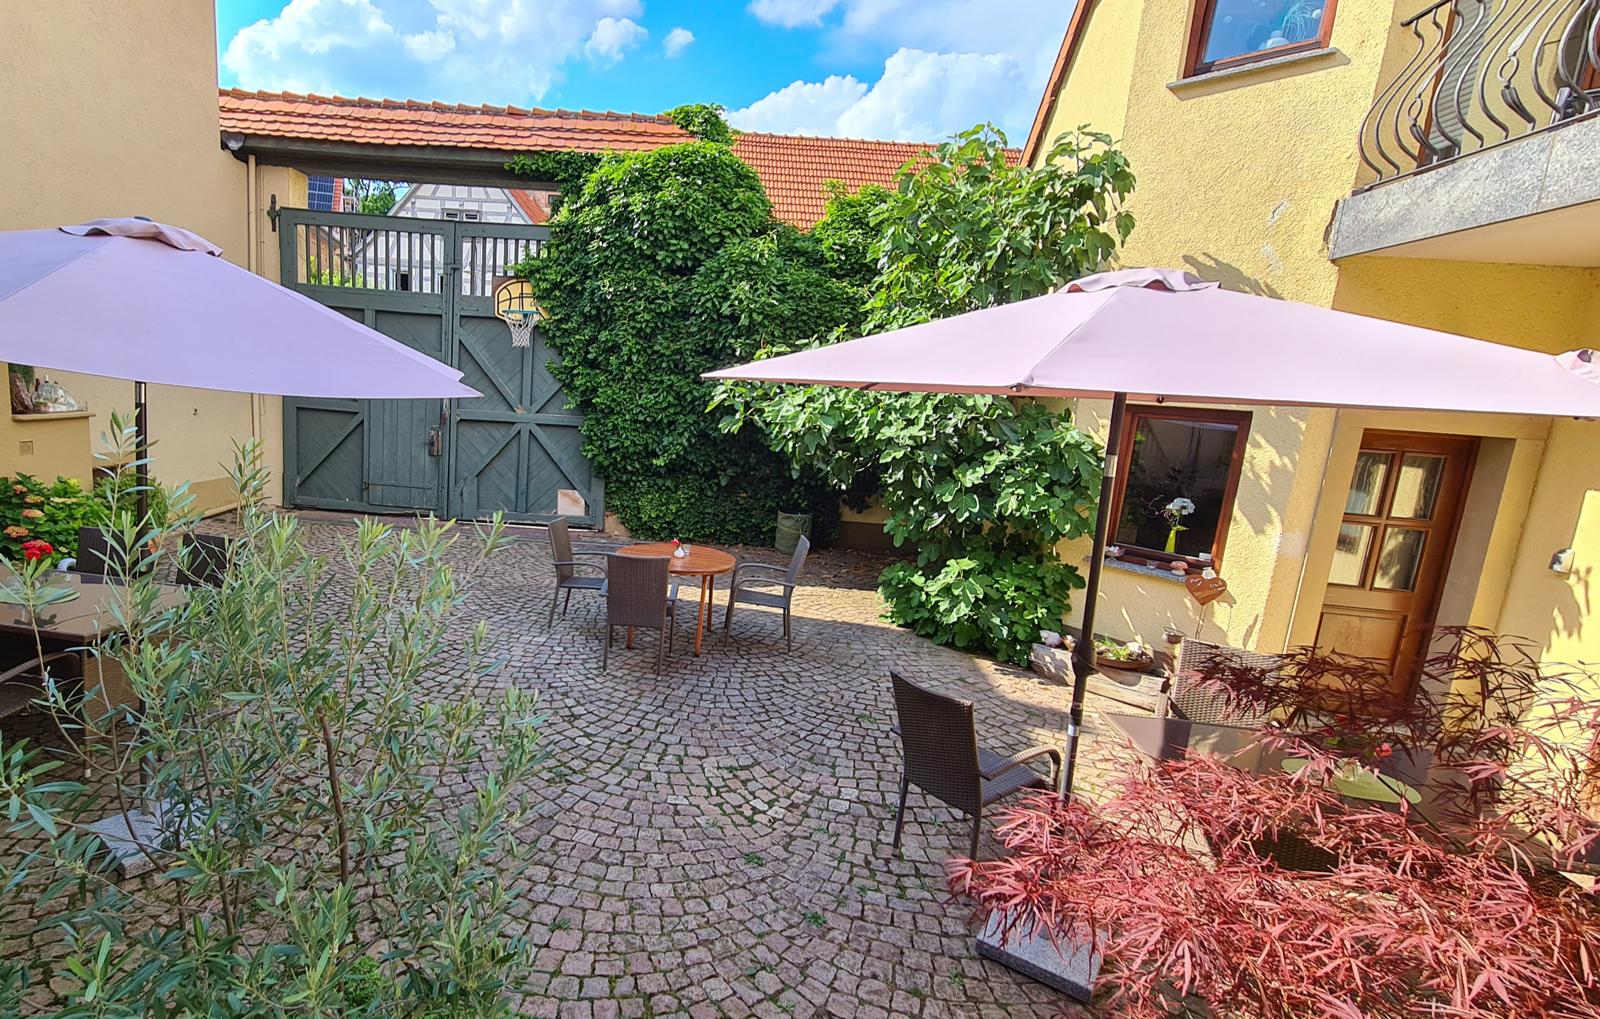 aktivurlaub-an-land-wonsheim-bg4